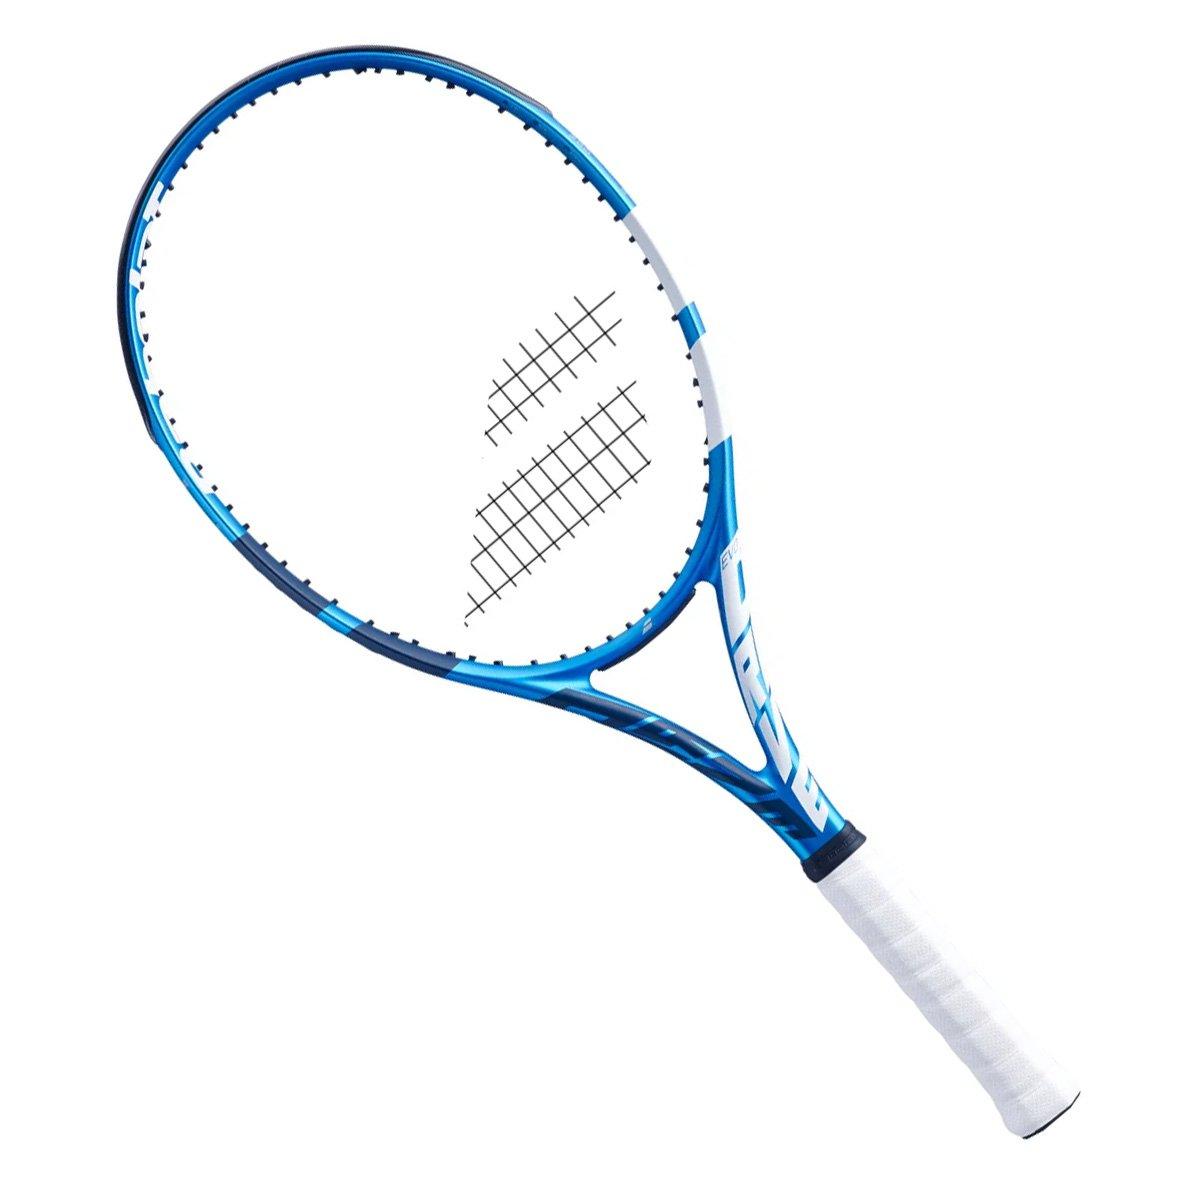 Raquete de Tênis Babolat Evo Drive Azul 16x17 270g 2021 L2